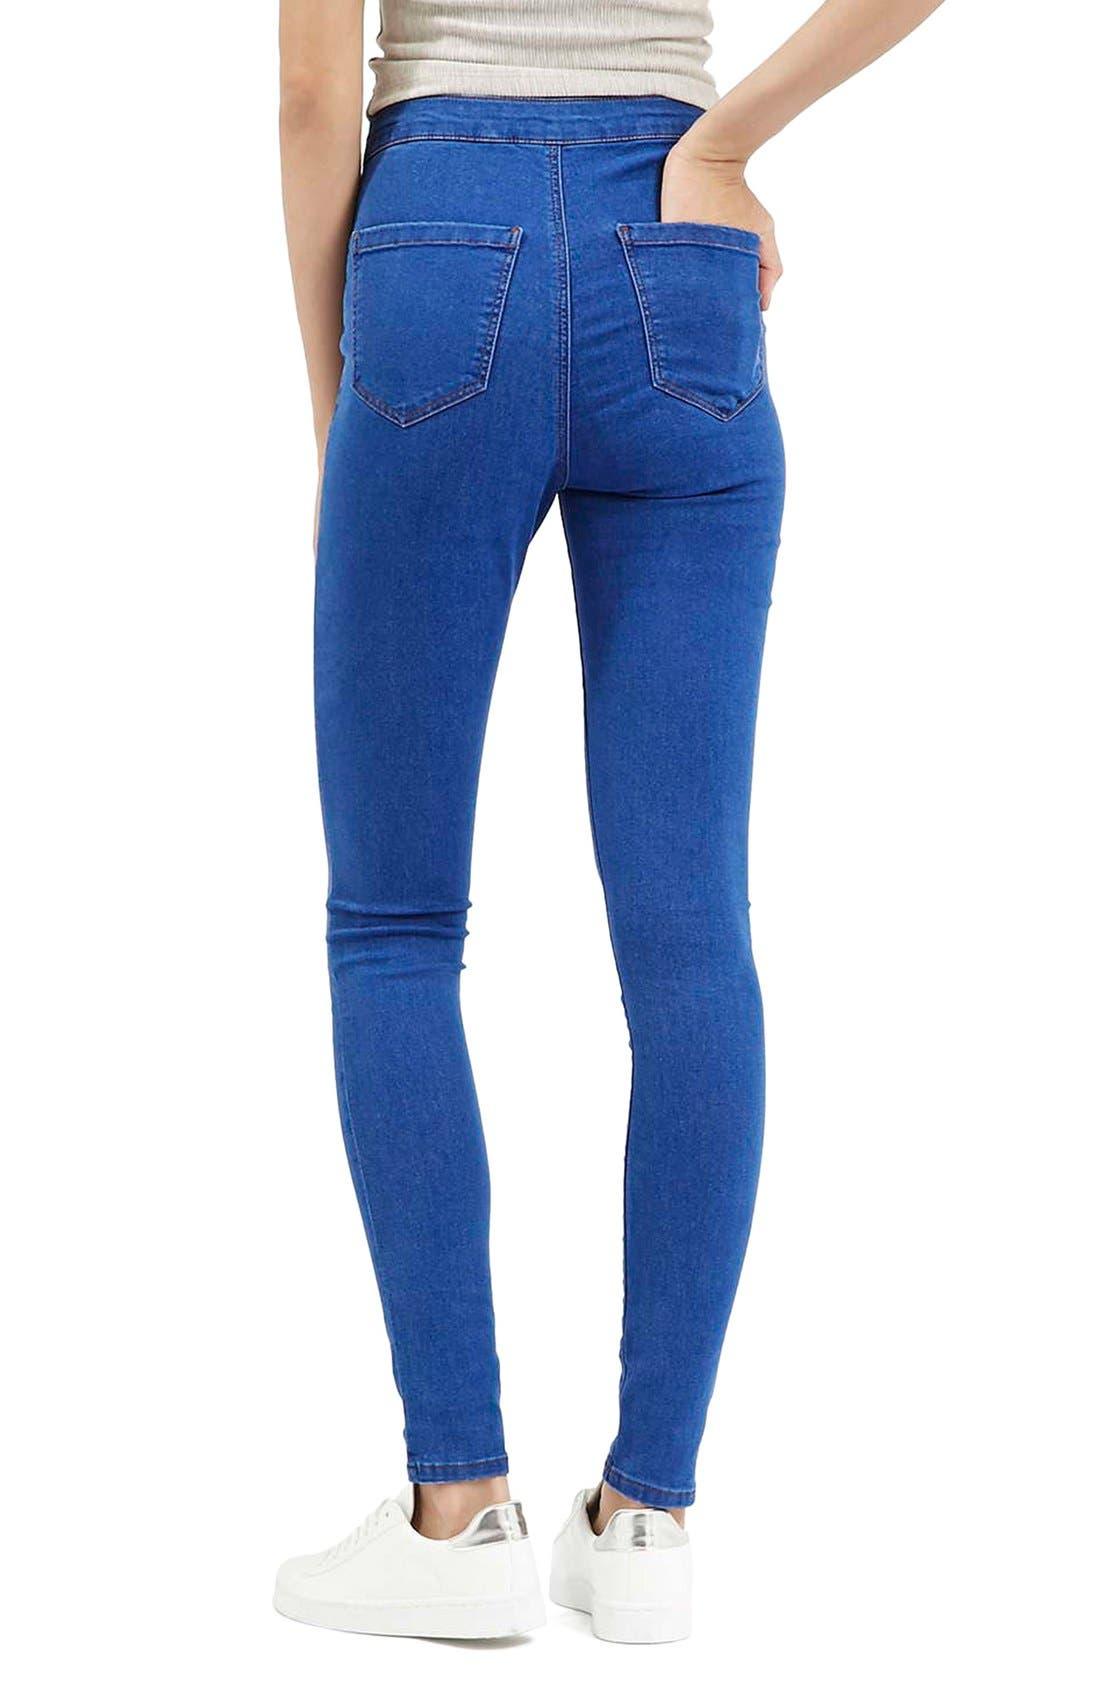 Alternate Image 3  - Topshop'Joni' High Rise Skinny Jeans (Bright Blue)